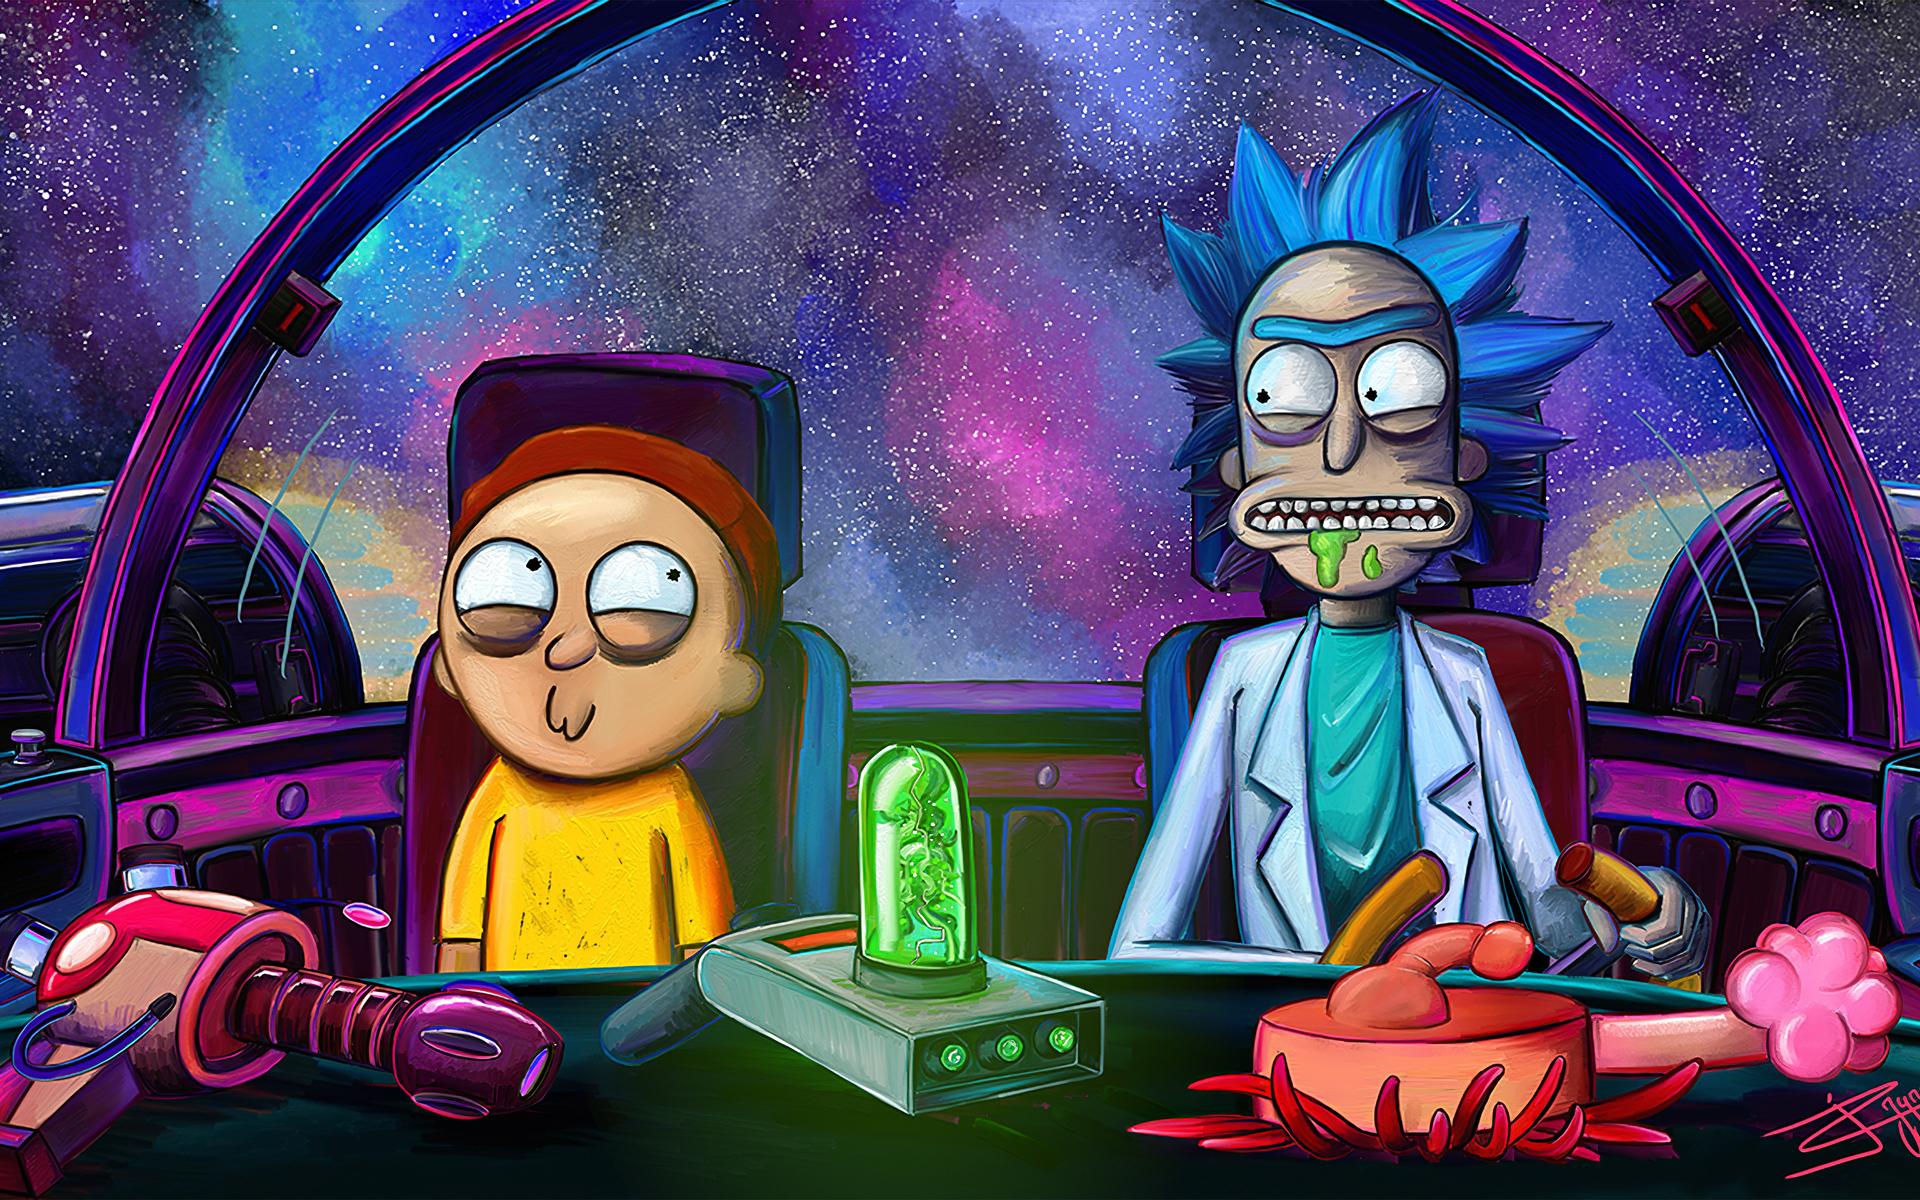 1920x1200 Rick And Morty Netflix 2020 1080P Resolution HD ...